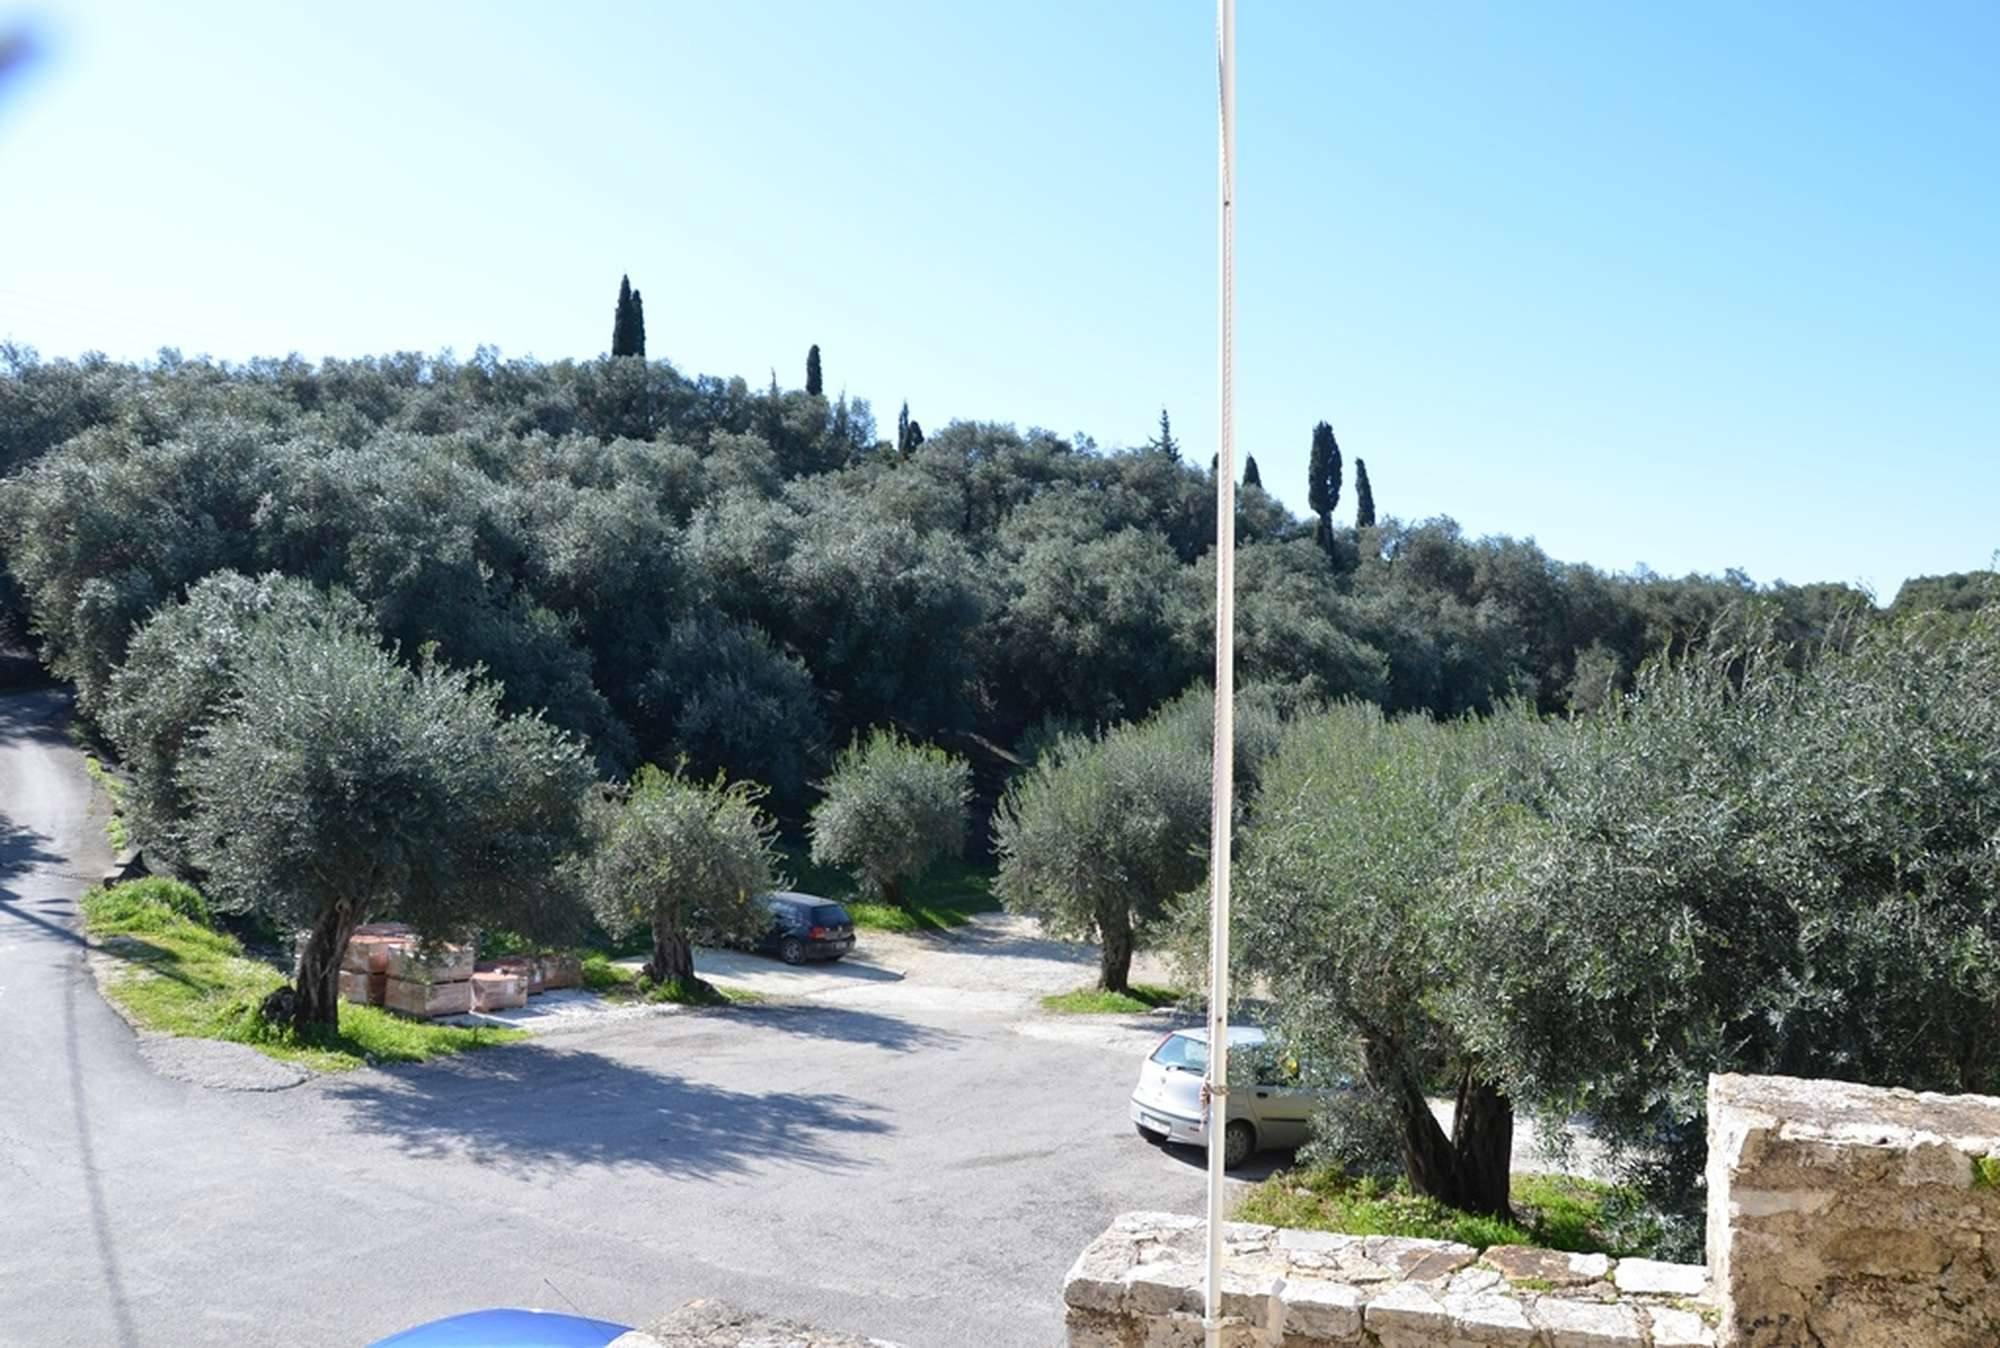 Оливковая роща монастыря Пантократор